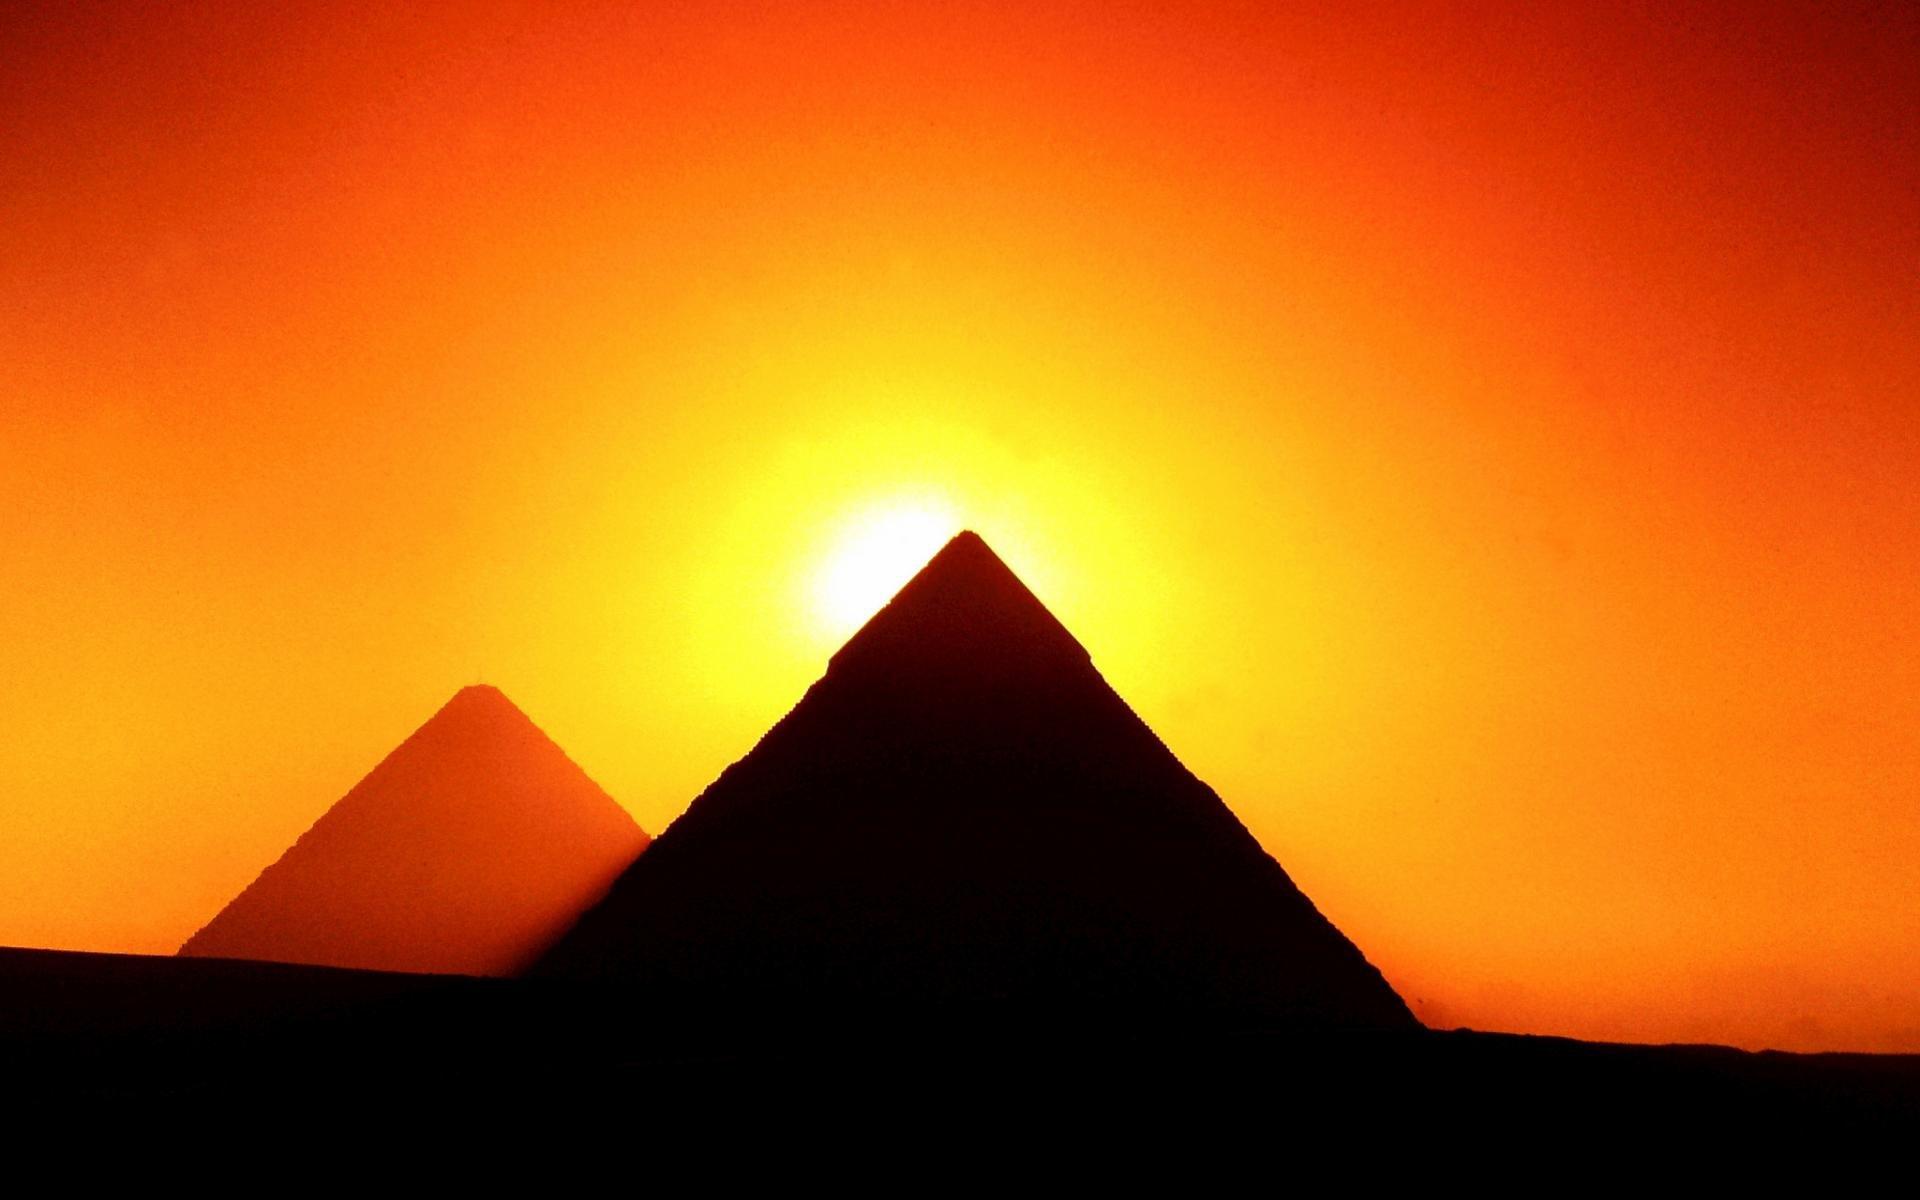 Free Download Pyramid Wallpaper Id490864 Hd 1920x1200 For